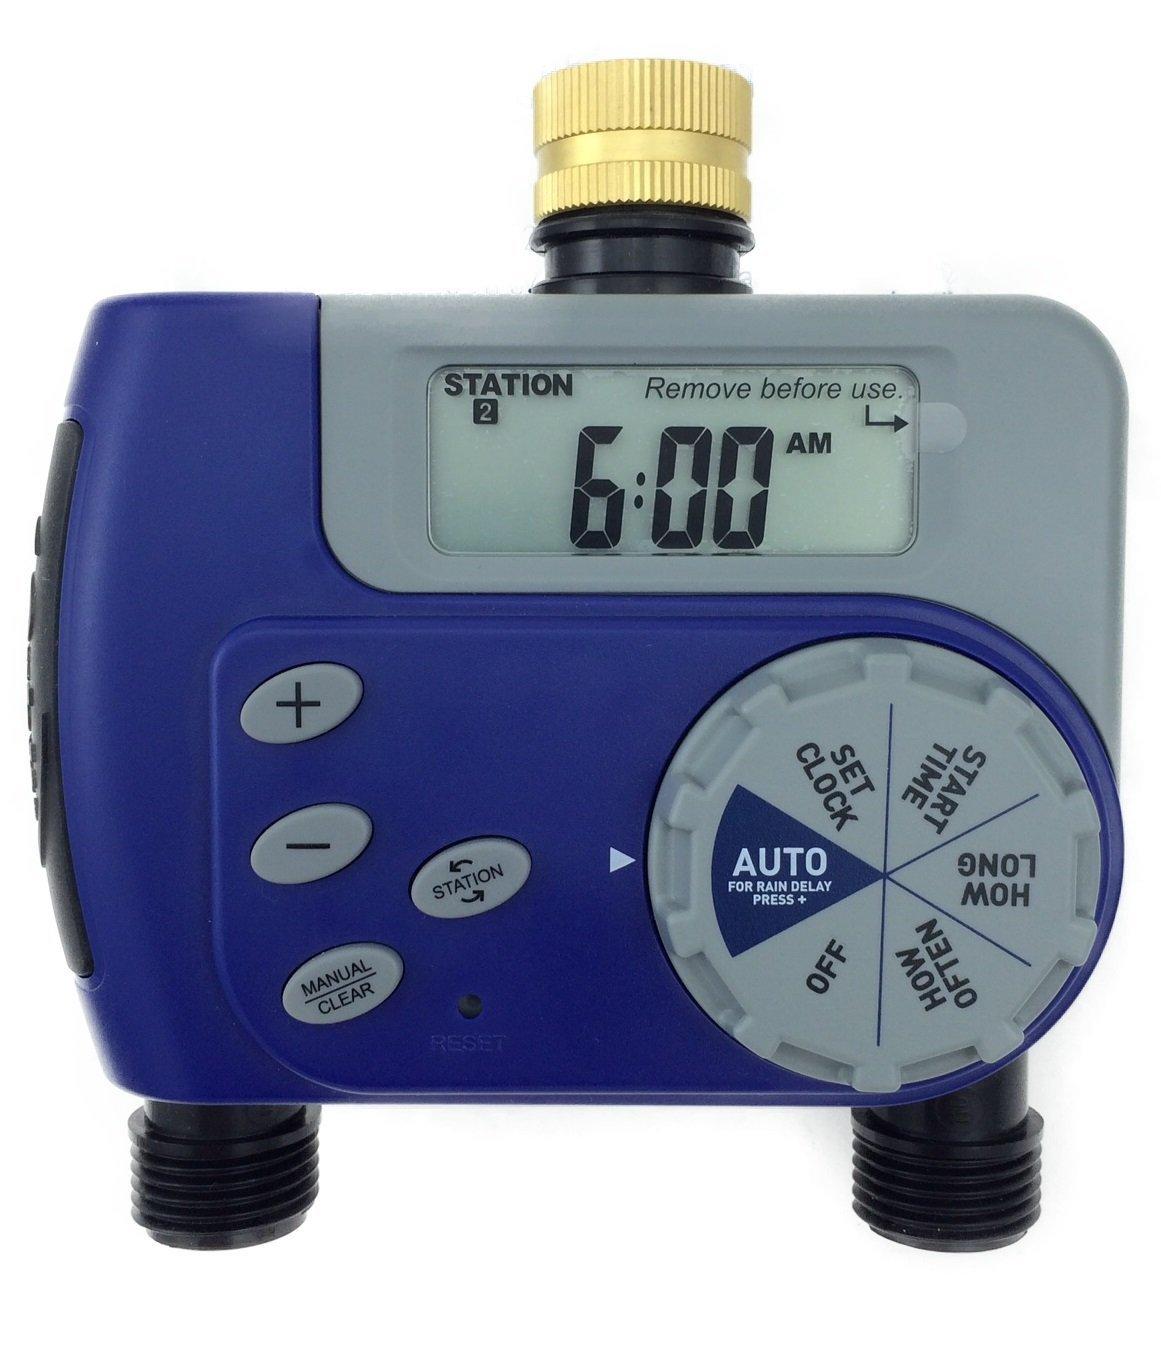 10 Pack - Orbit 1-Dial 2-Port Hose Faucet Water Timer